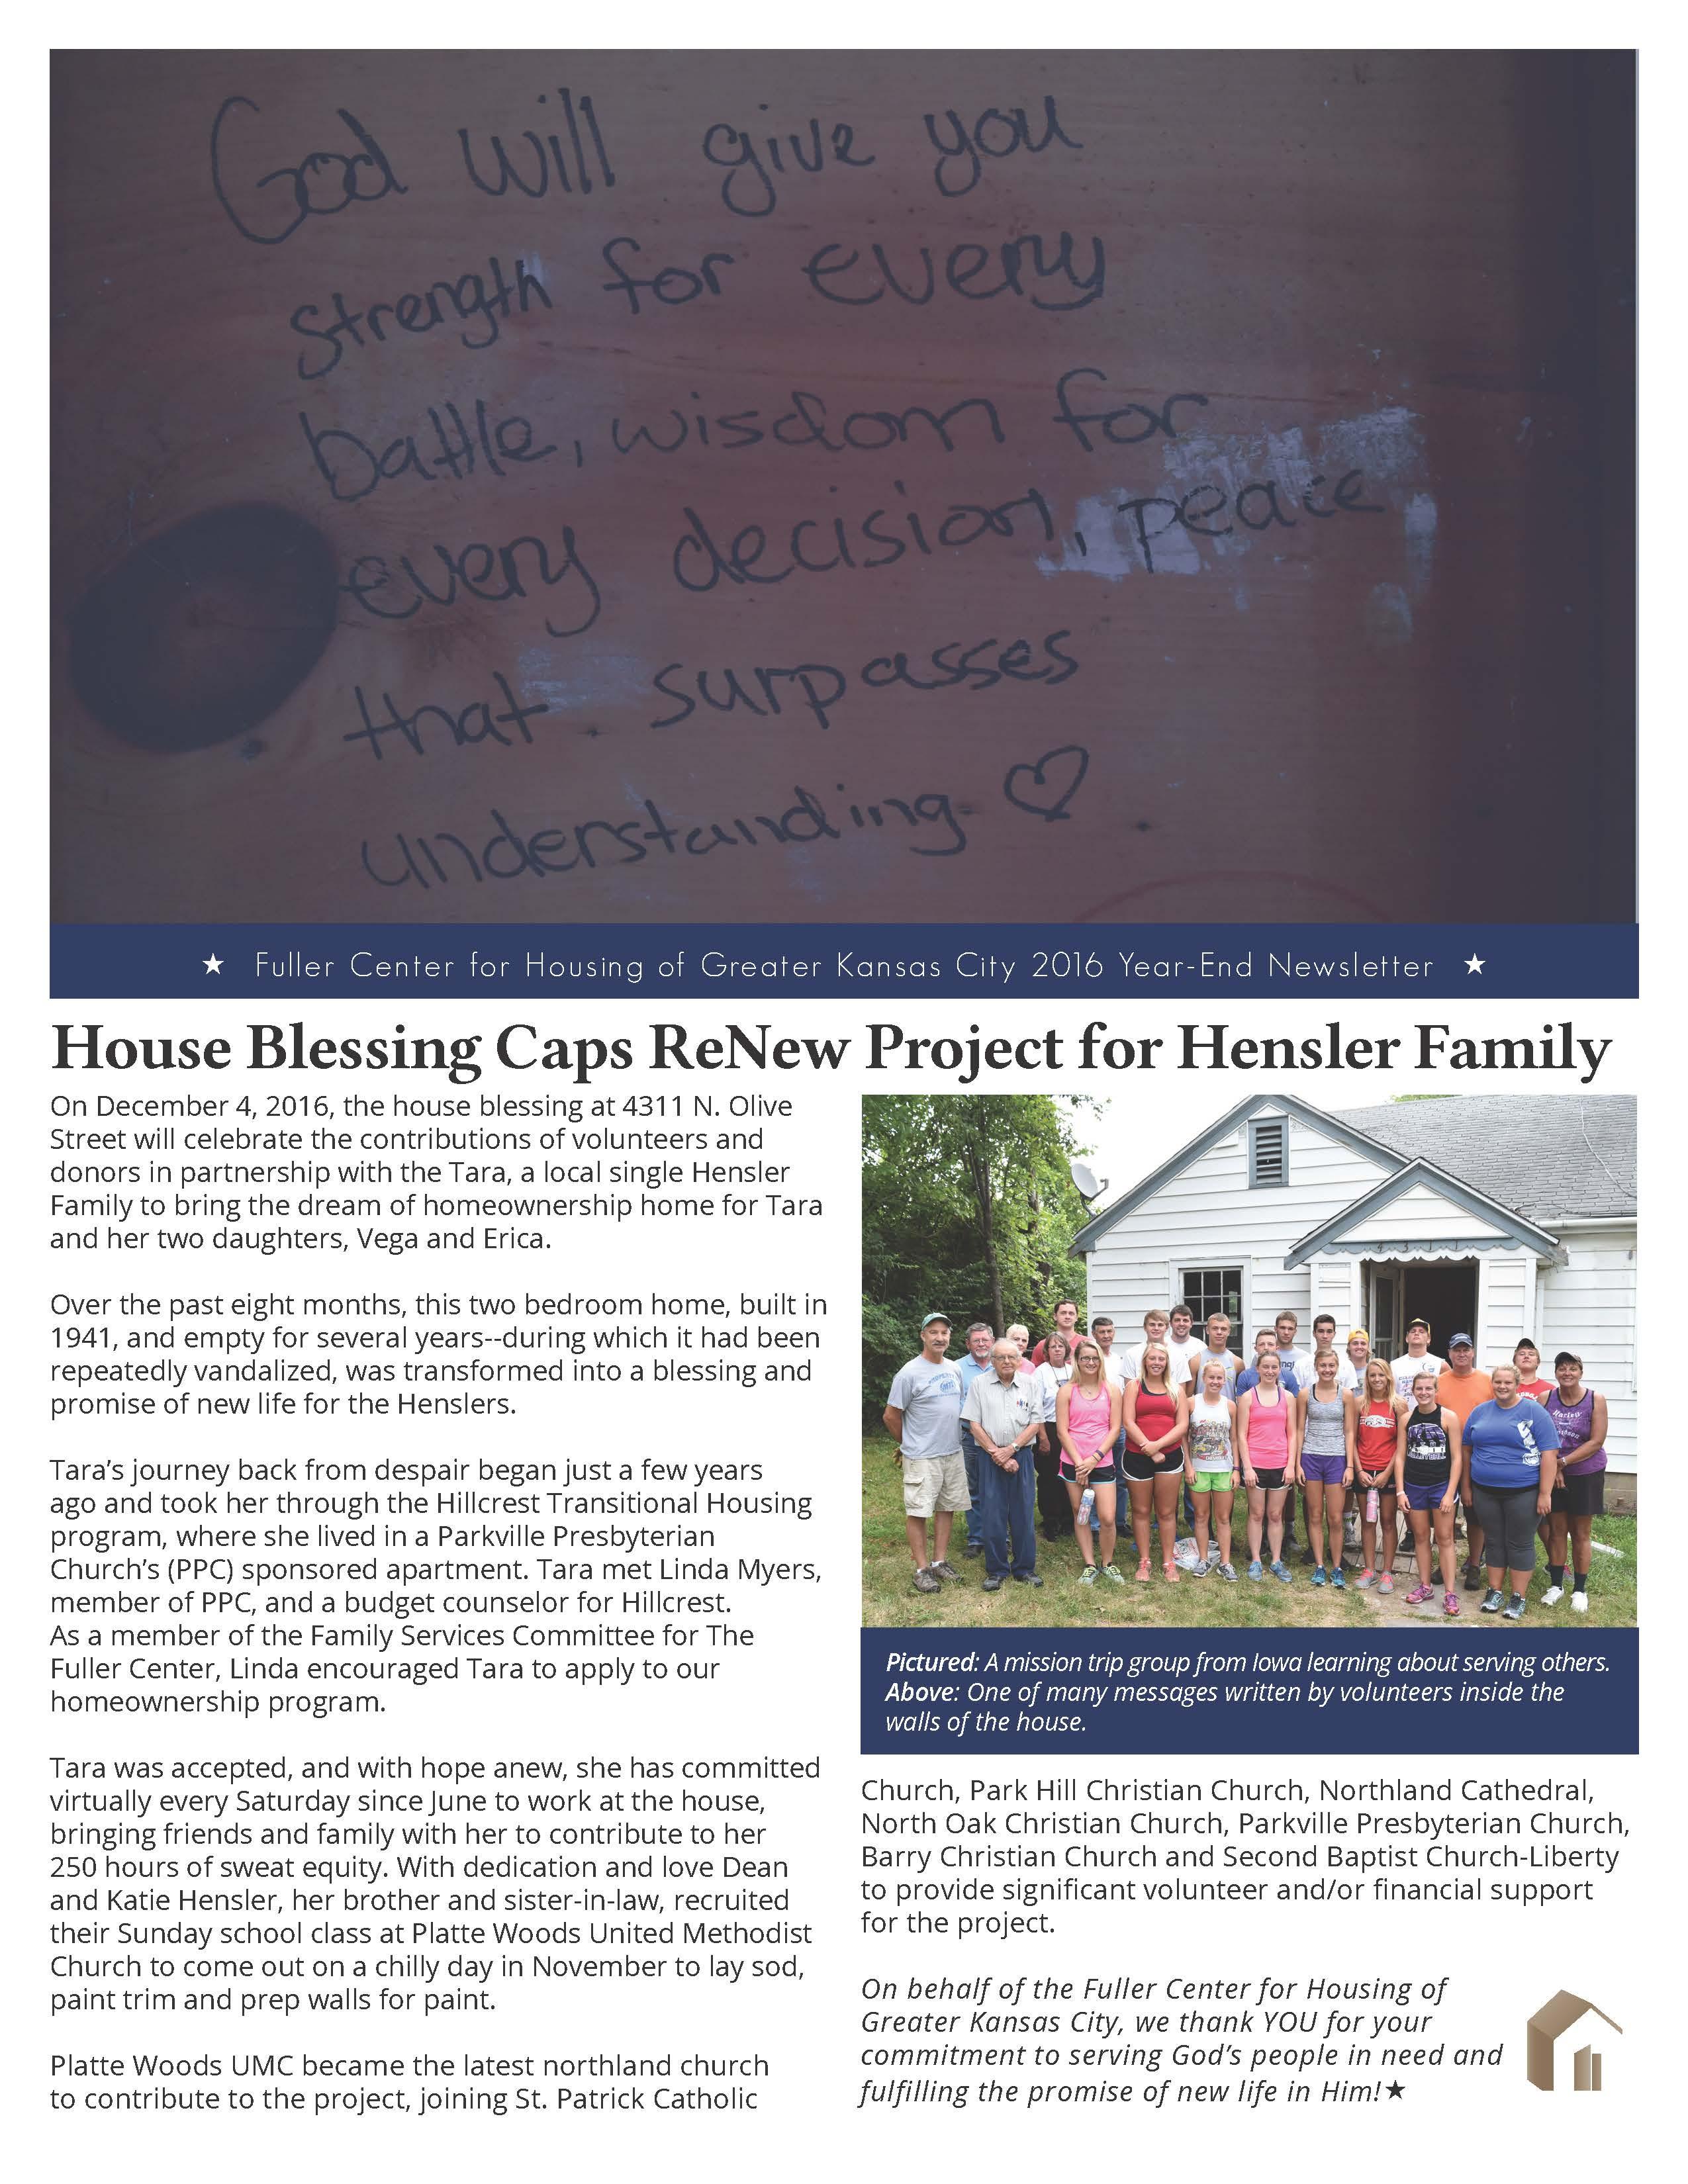 Screenshot: Front page of Fuller Center for Housing of Greater Kansas City newsletter